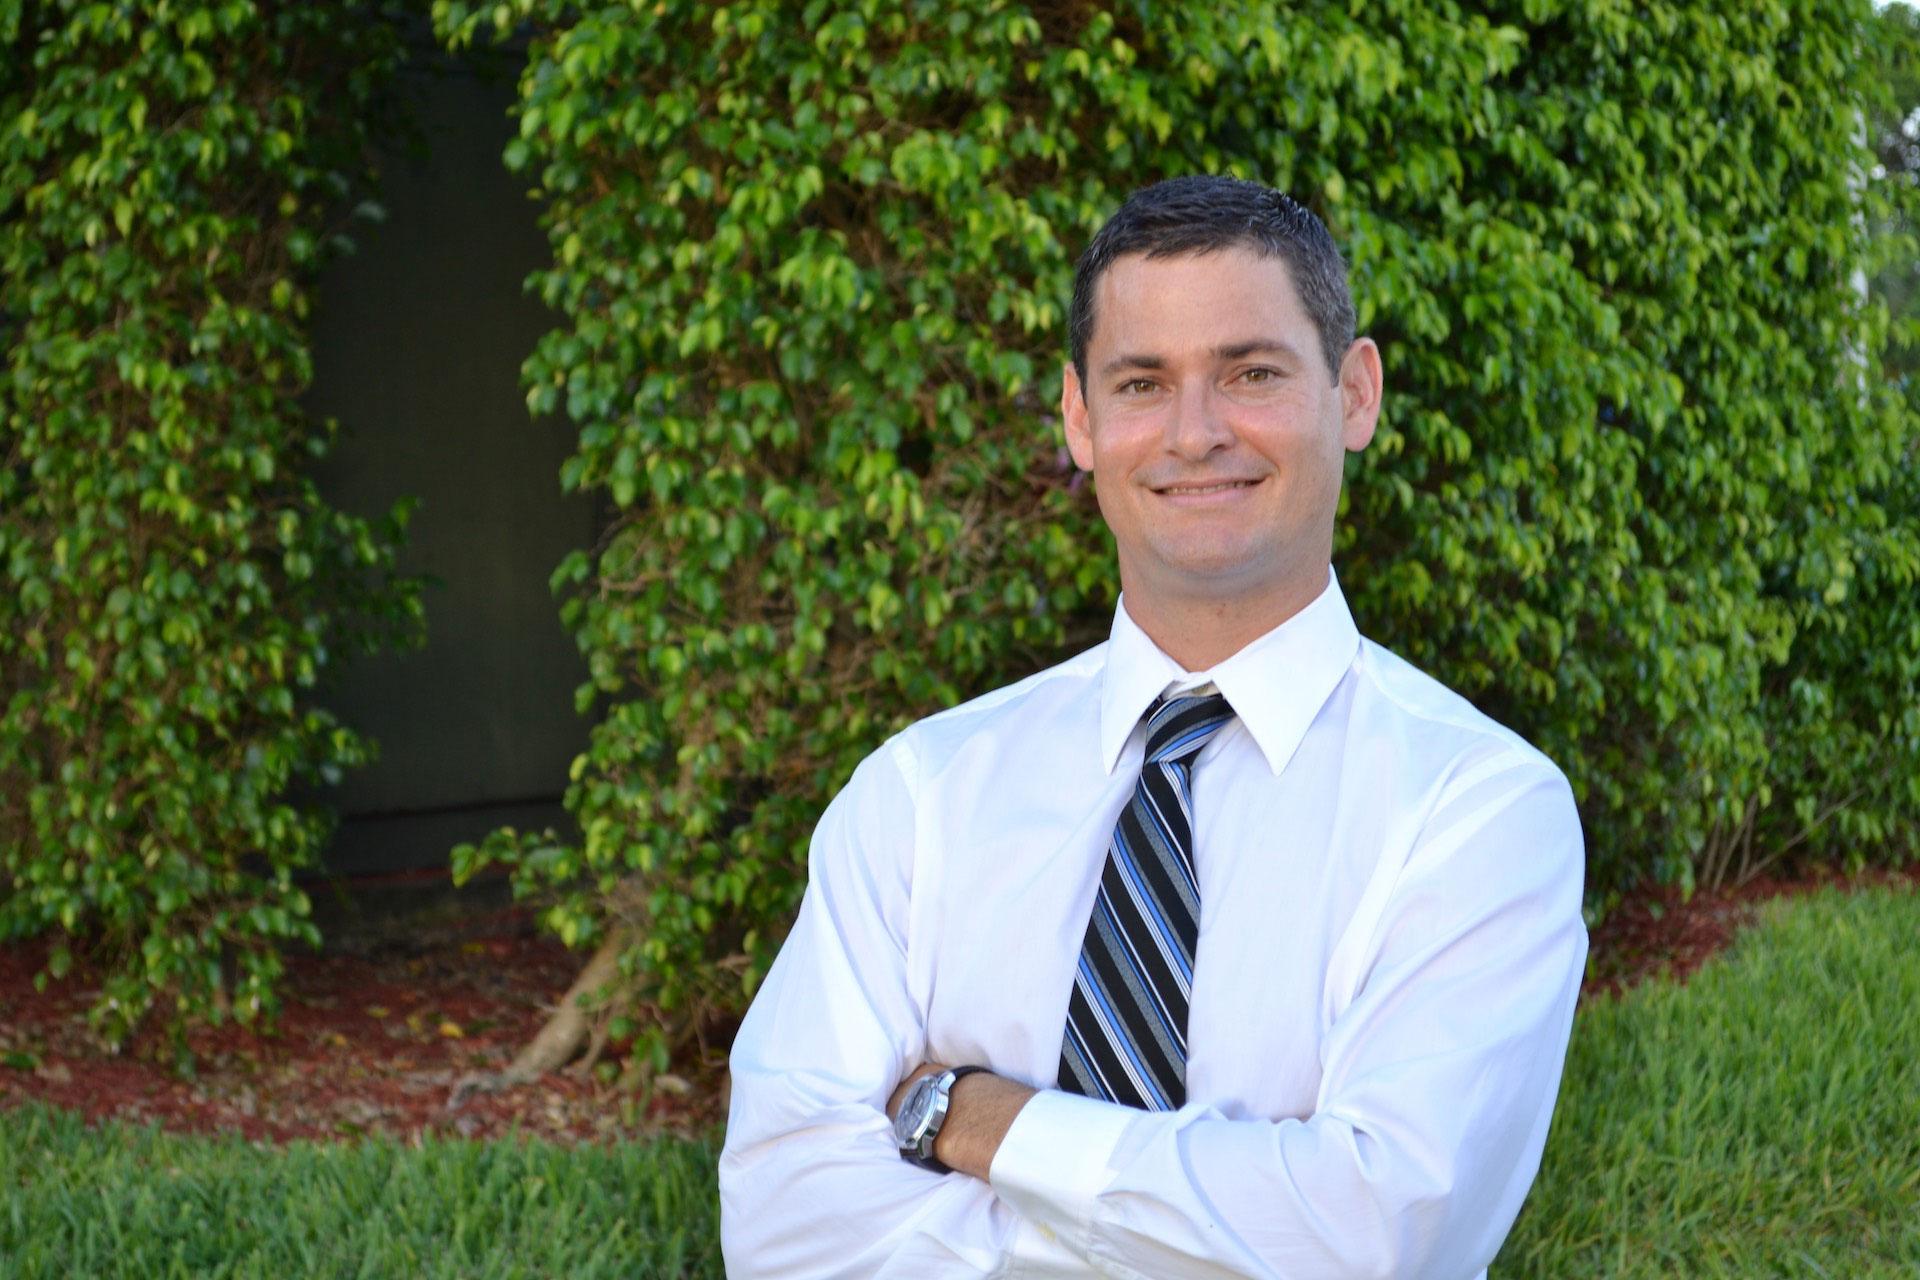 Dr. Jason Gill